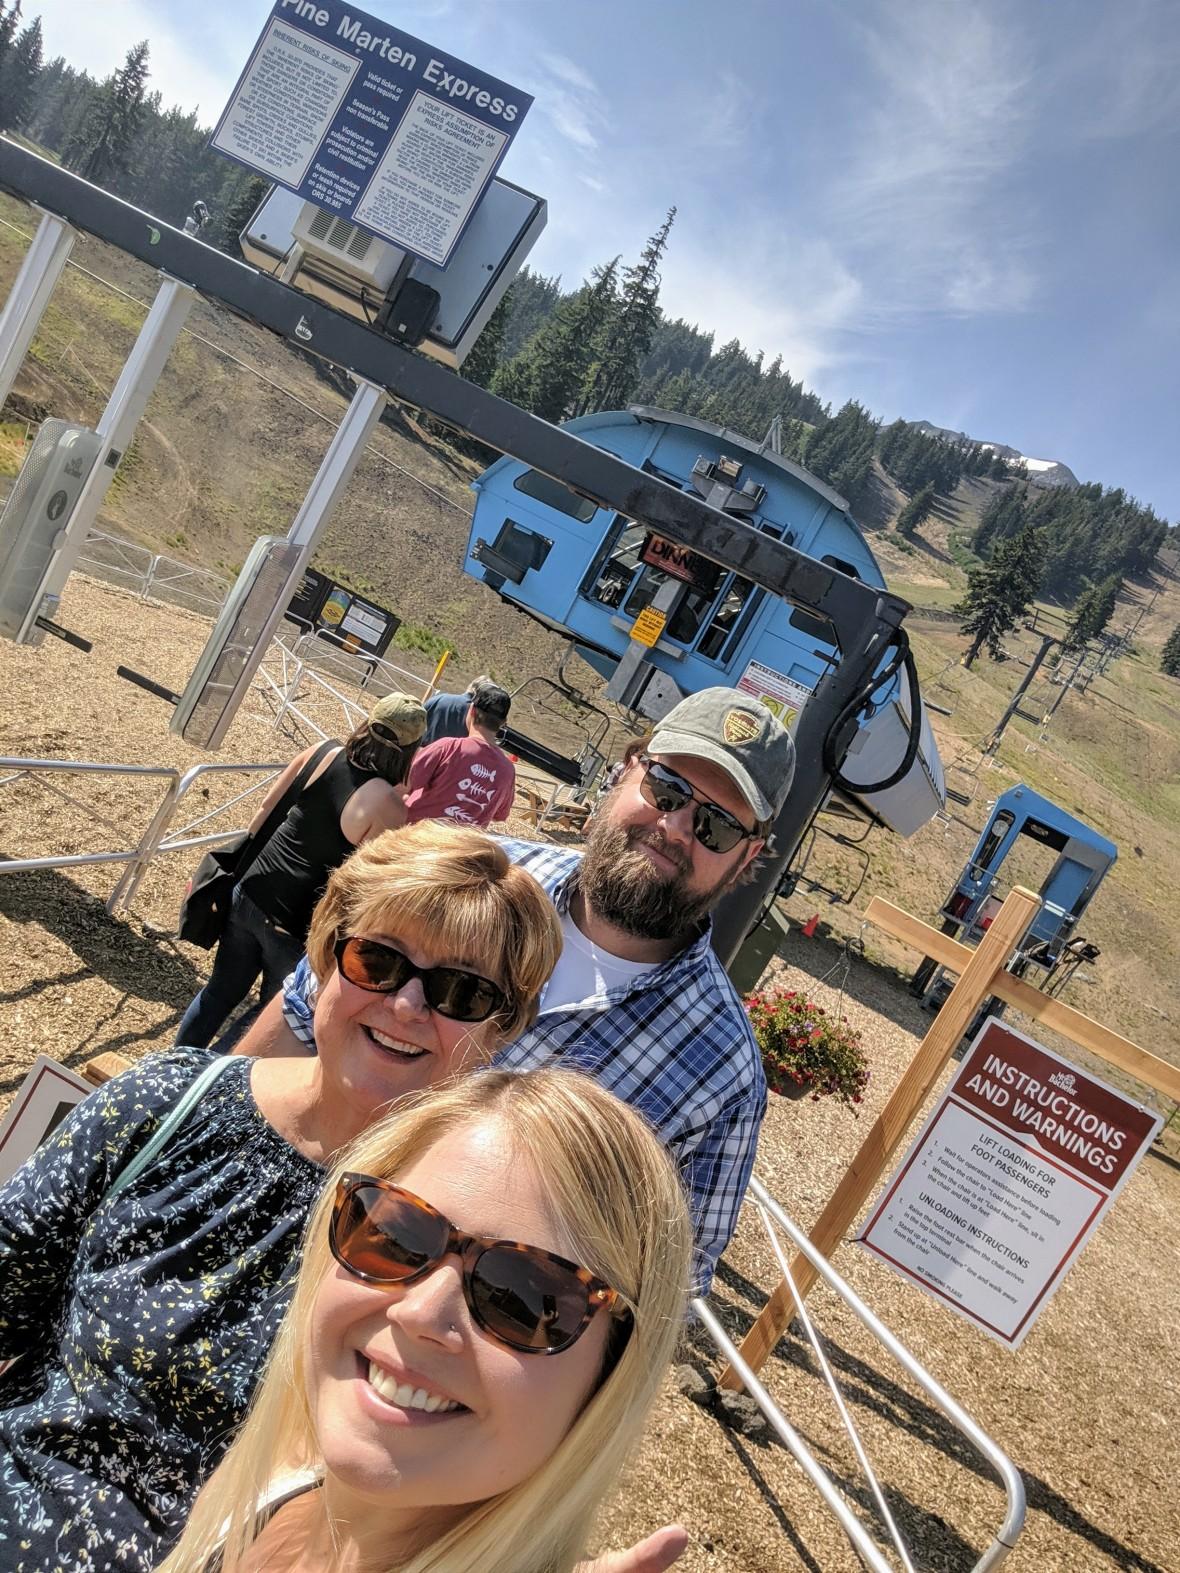 Mount Bachlor summer ski lift Aug 2019